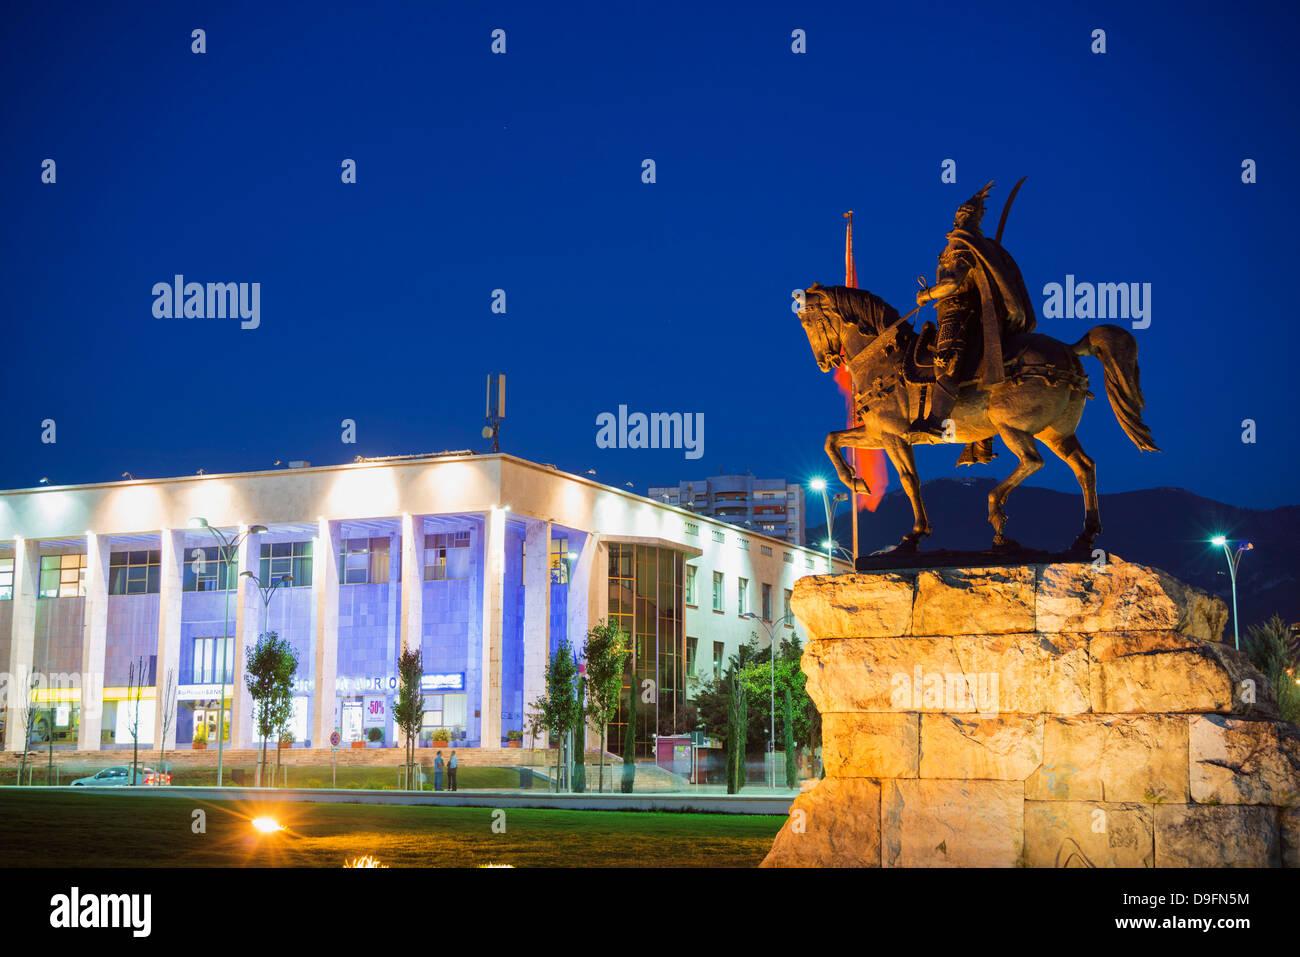 Equestrian statue of Skanderbeg, Tirana, Albania - Stock Image